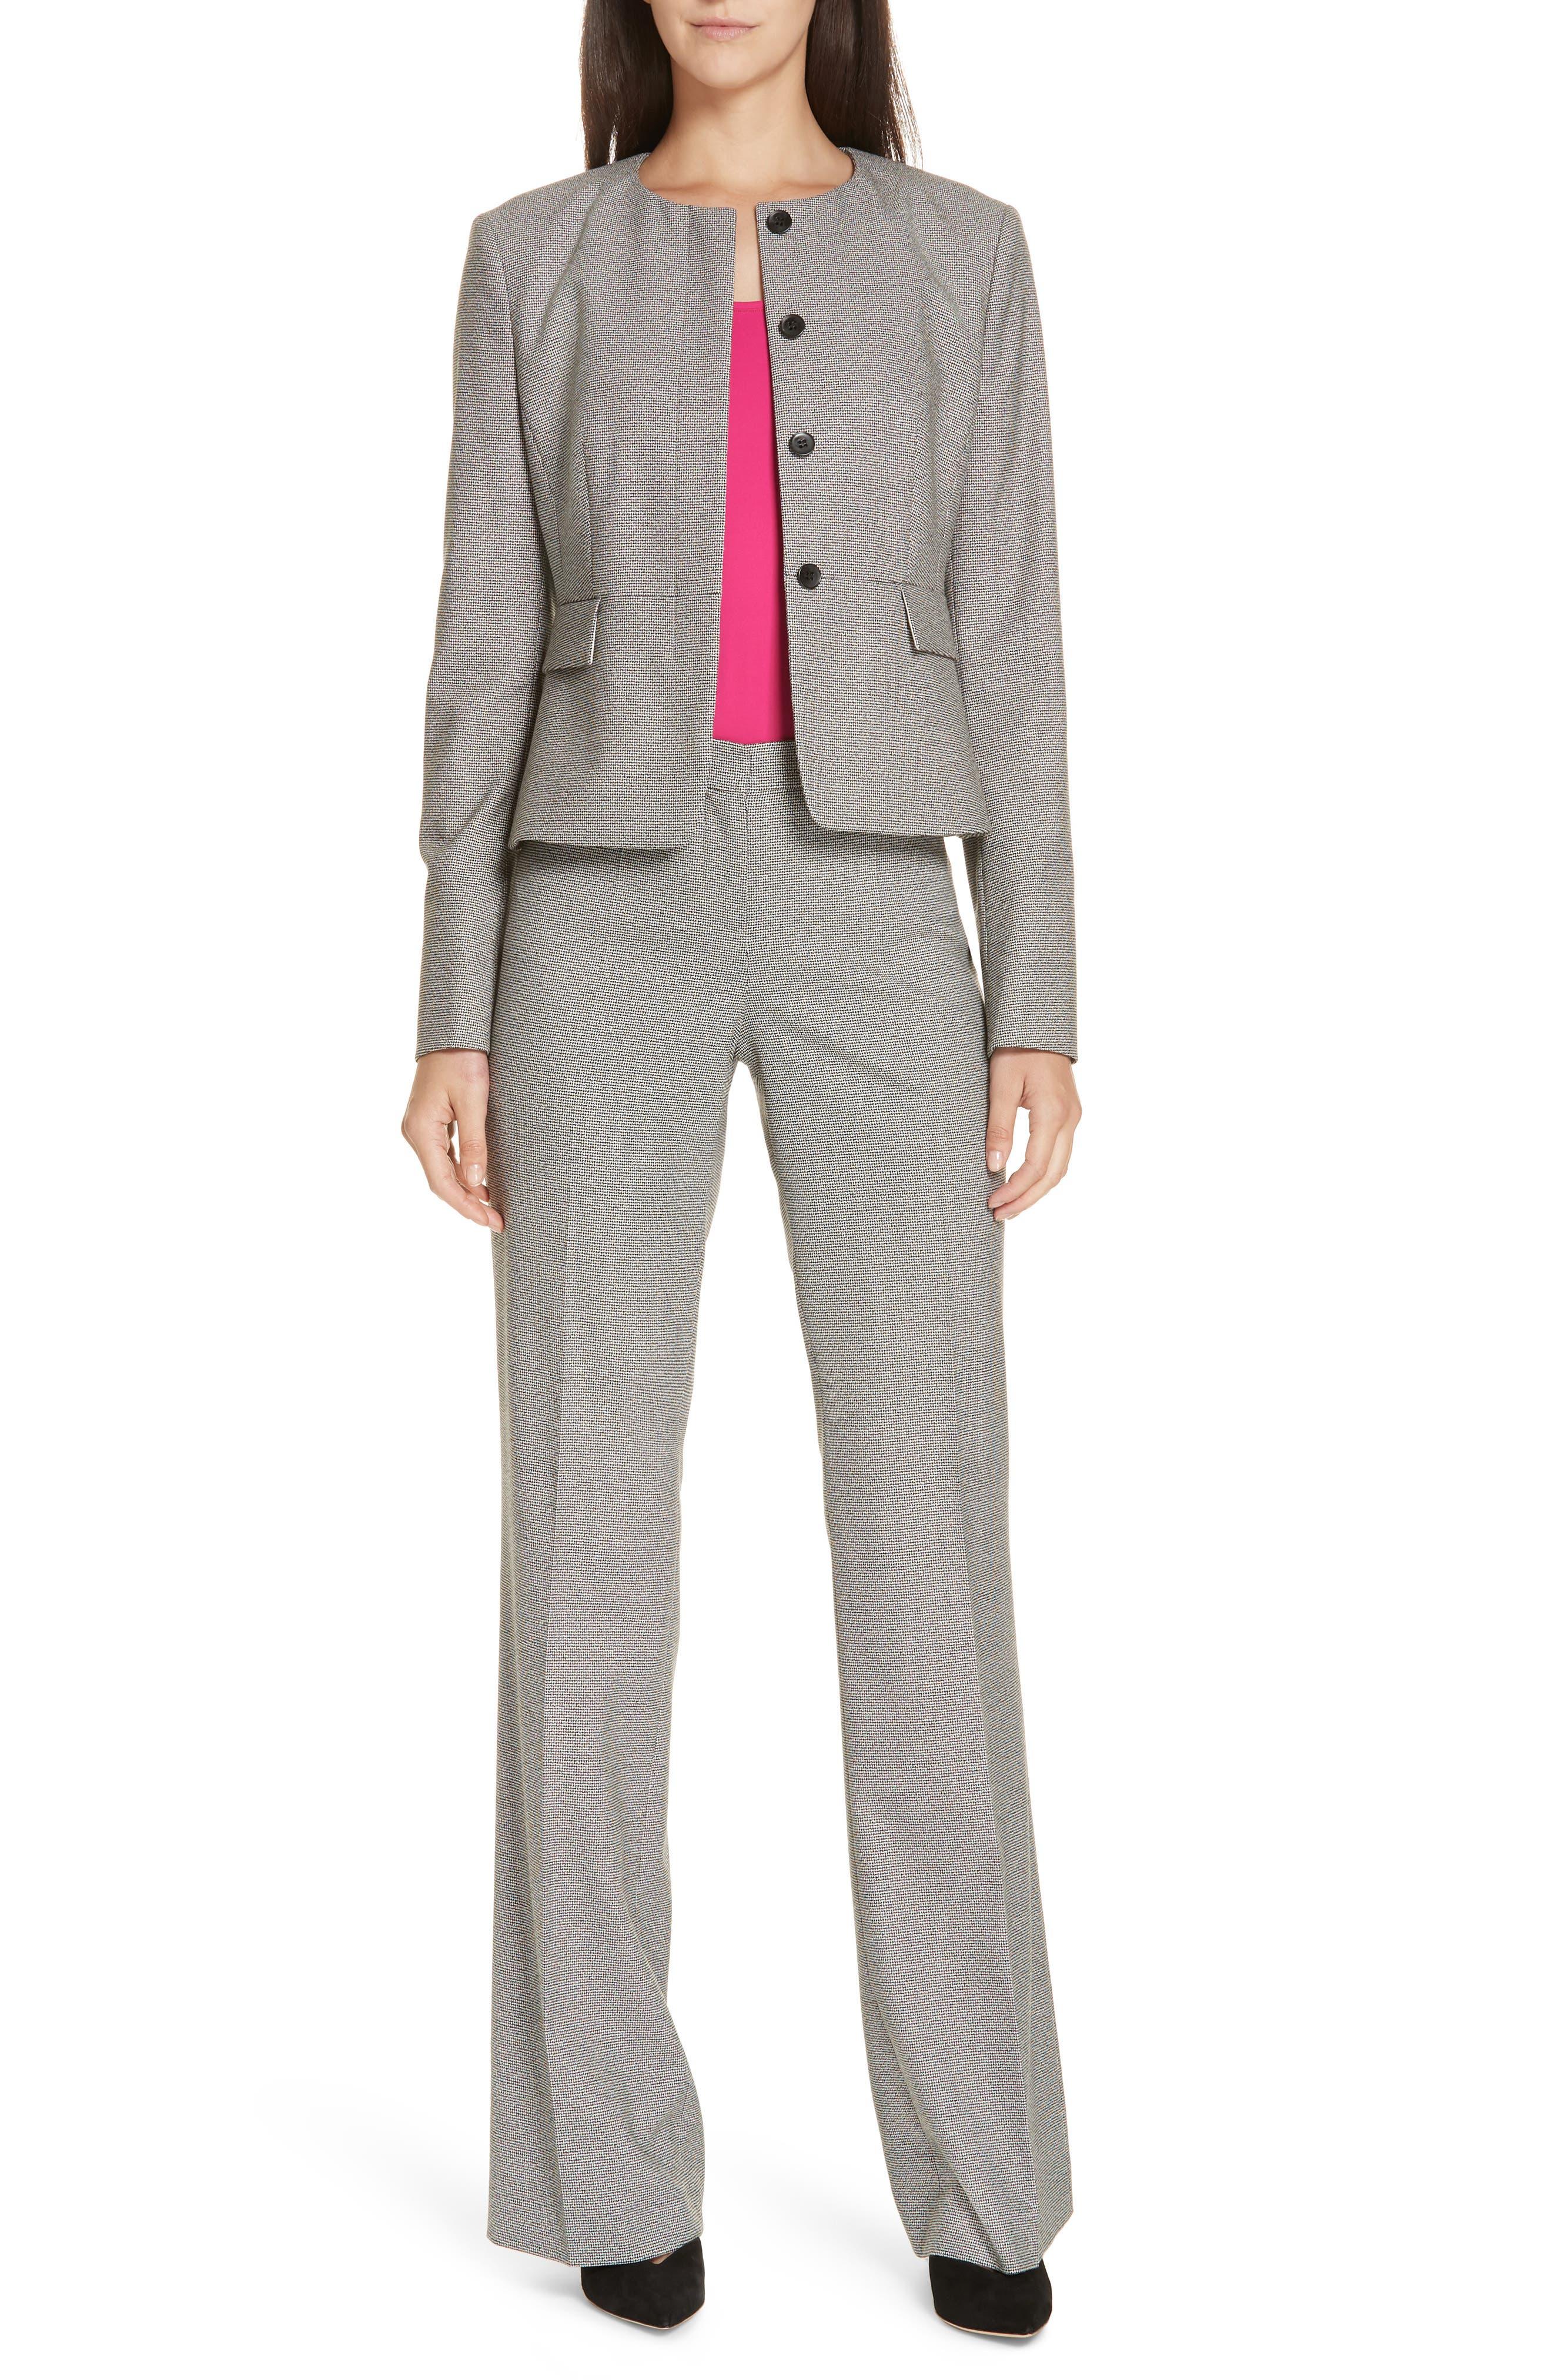 Tulea Blurred Optic Wool Suiting Trousers,                             Alternate thumbnail 7, color,                             BLACK FANTASY